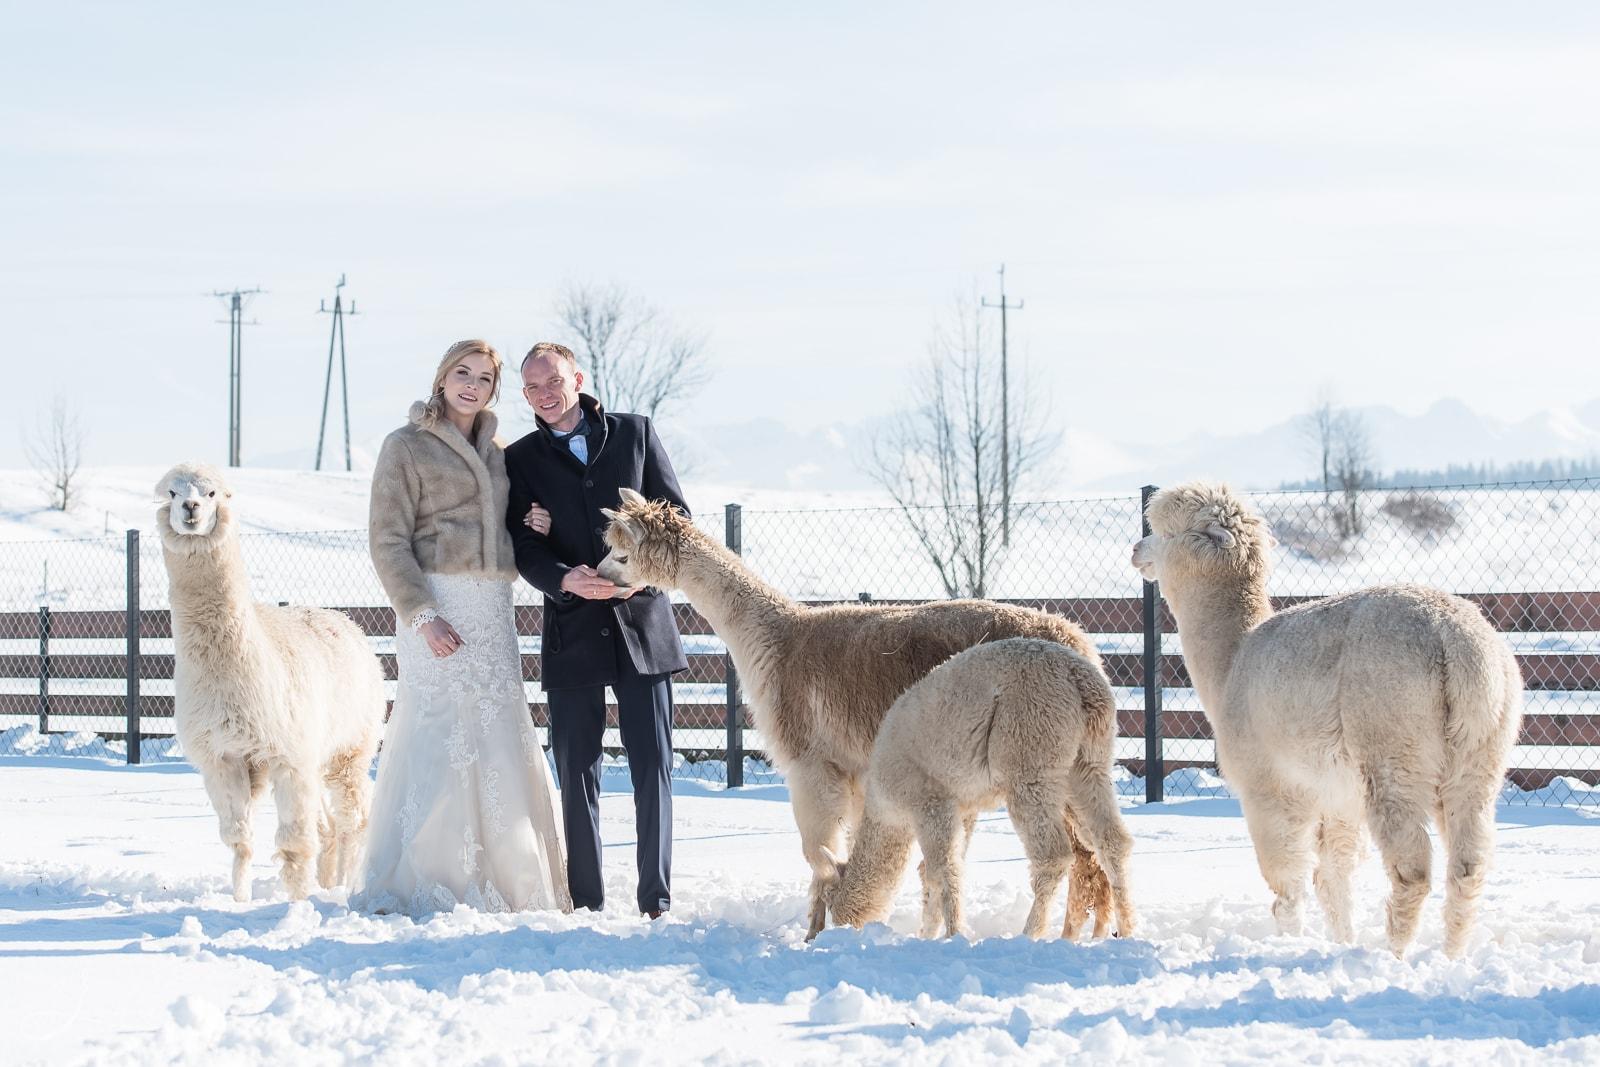 Sesja ślubna z alpakami, Osada Chochołowska